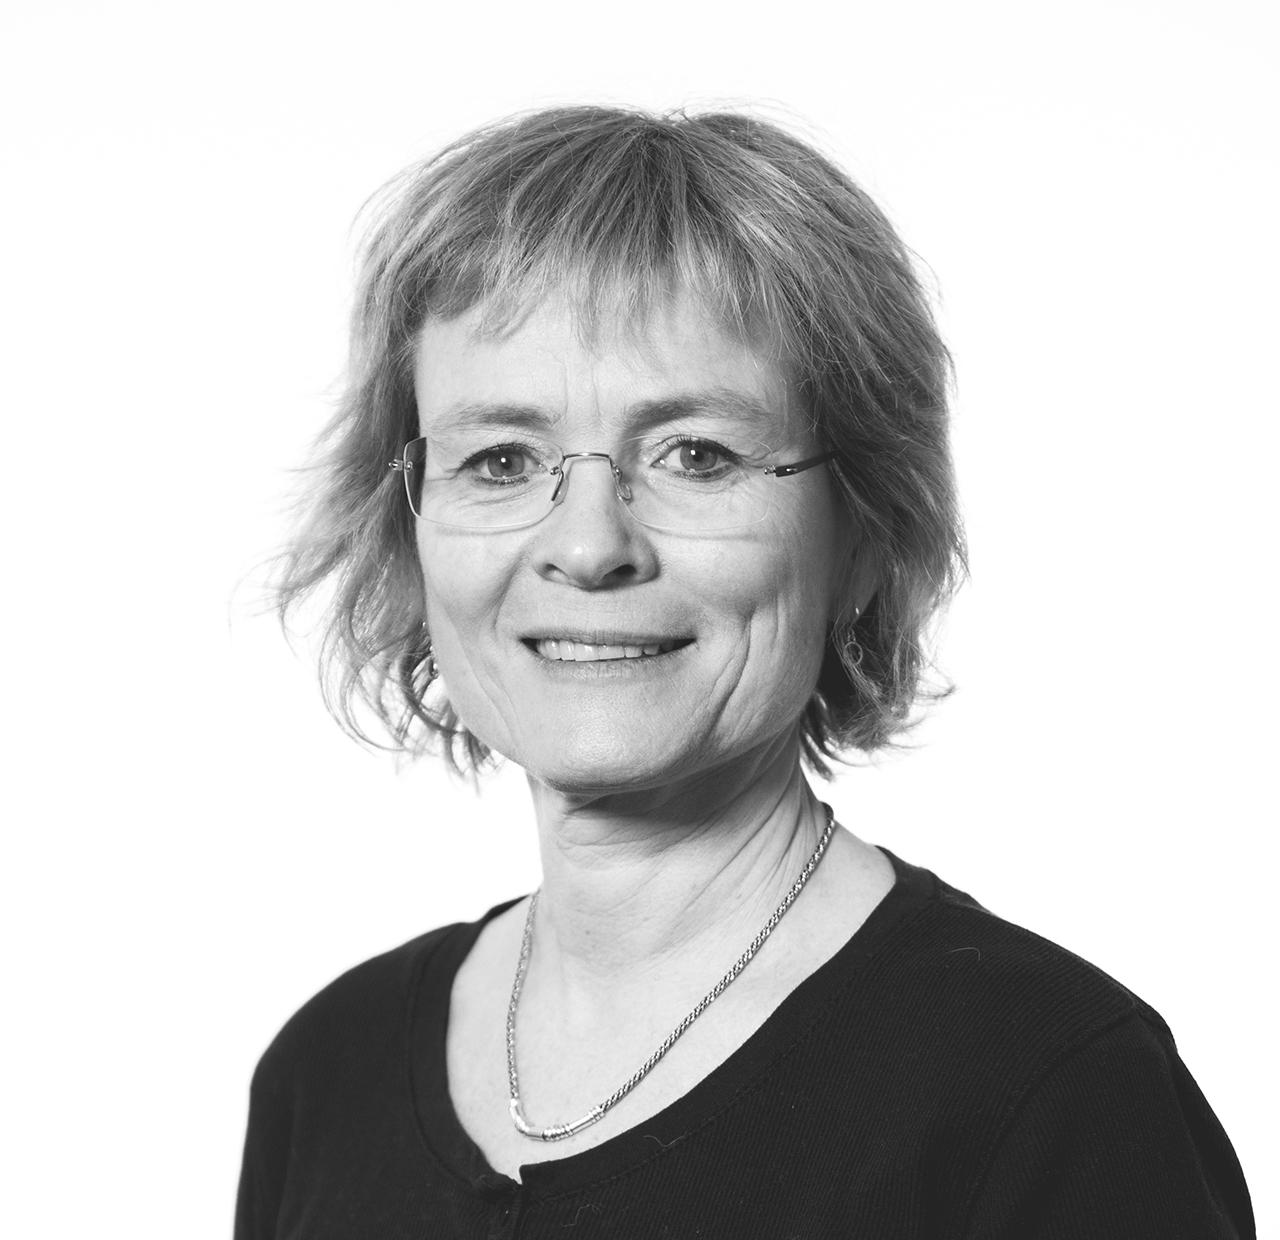 Randi Elizabeth Eeg Anderssen